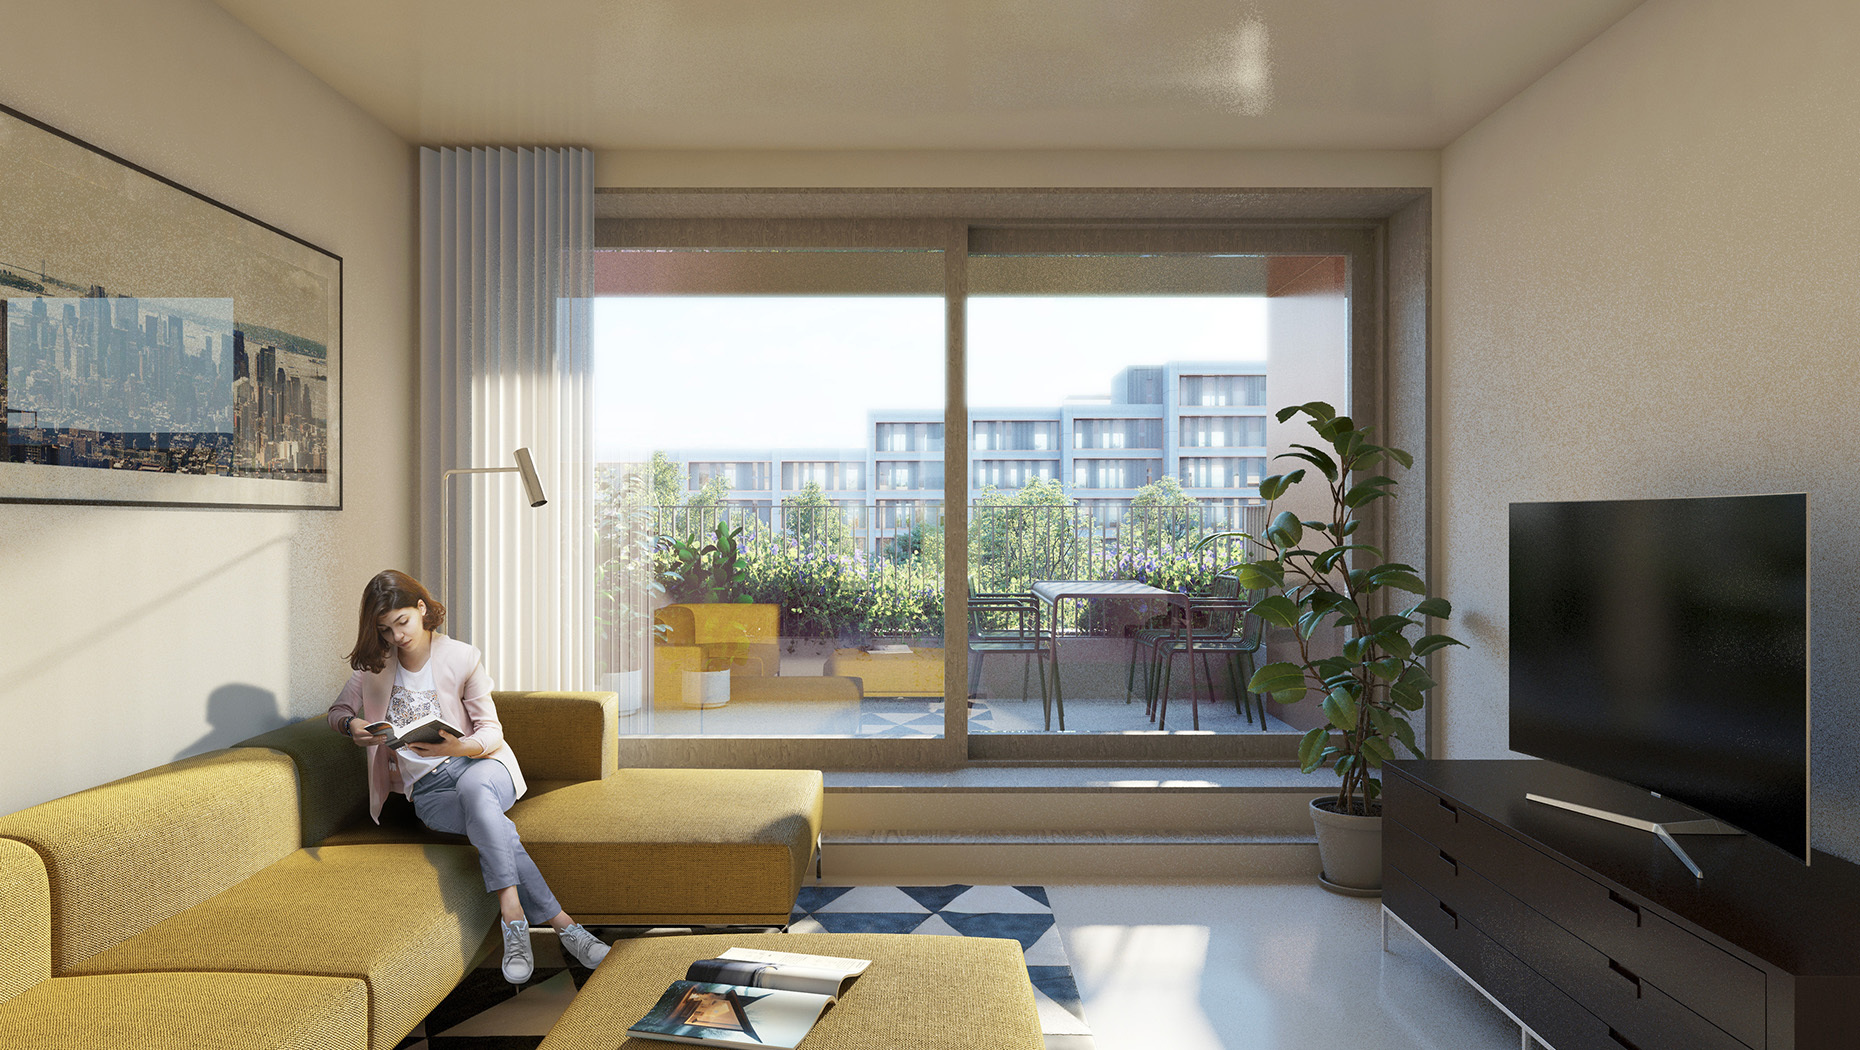 936 Residence N dra i kov N6 a4